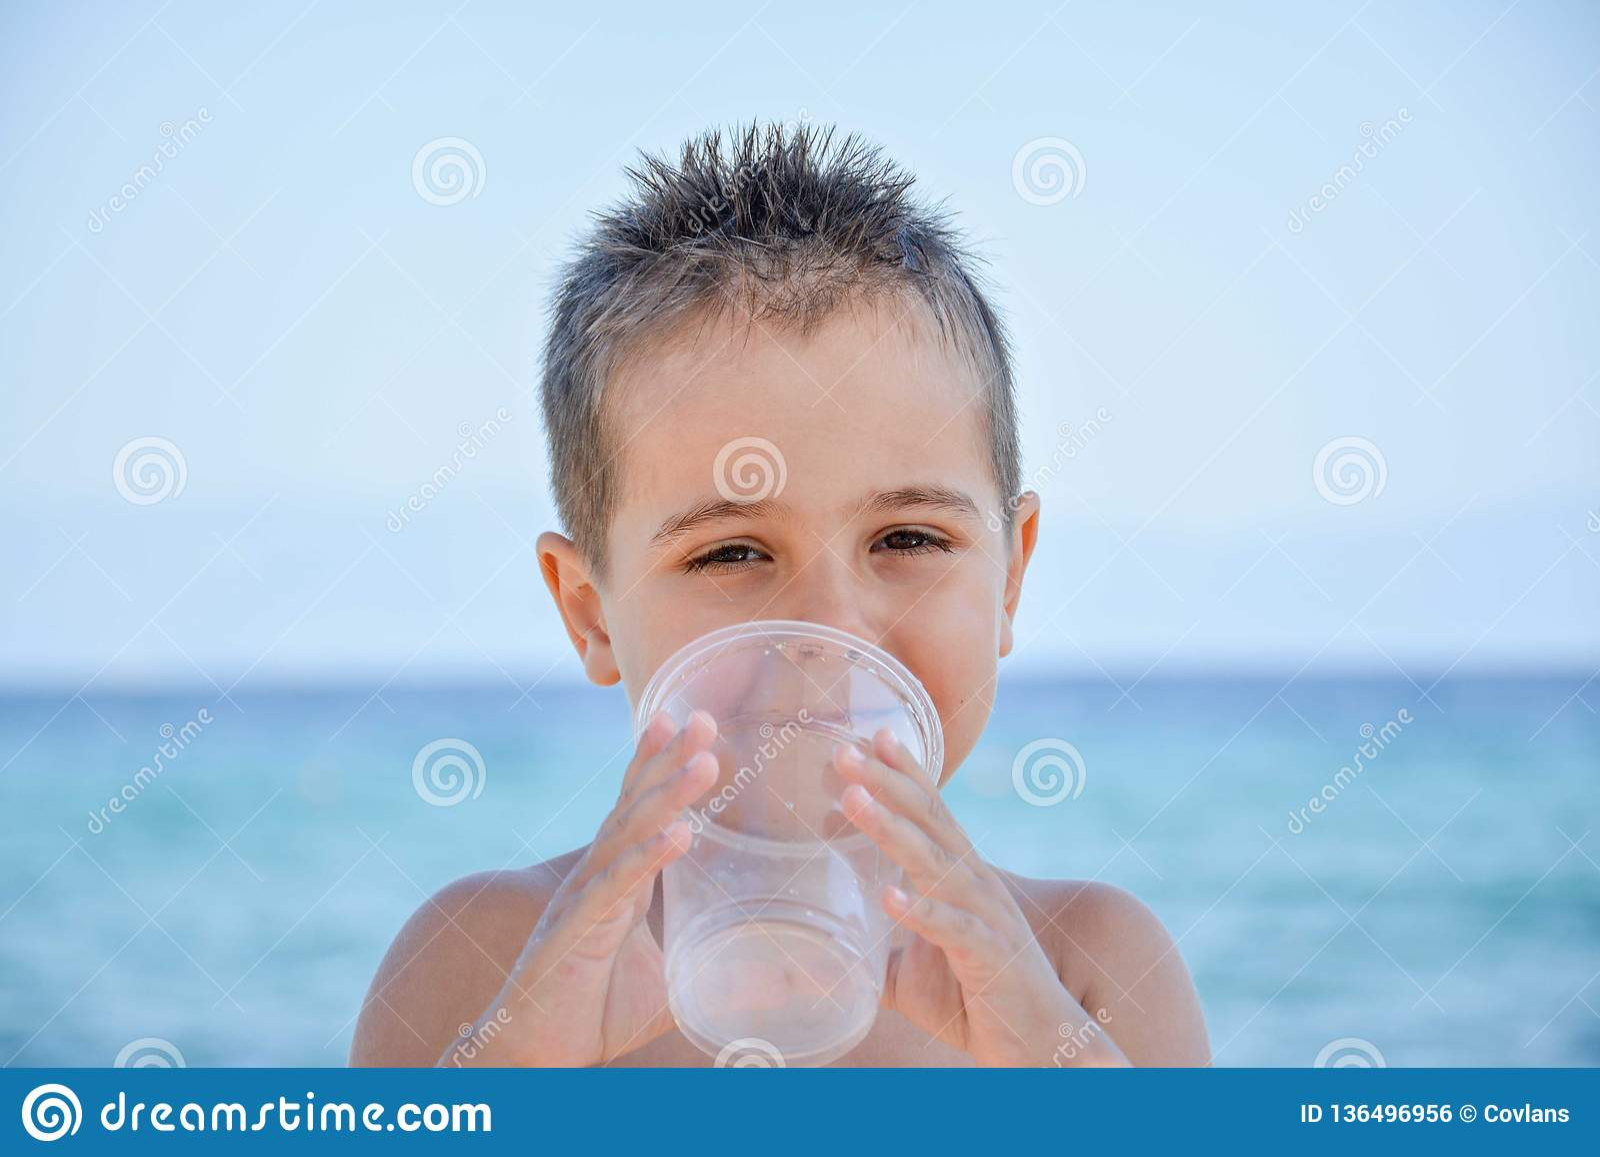 A cute boy posing on the beach